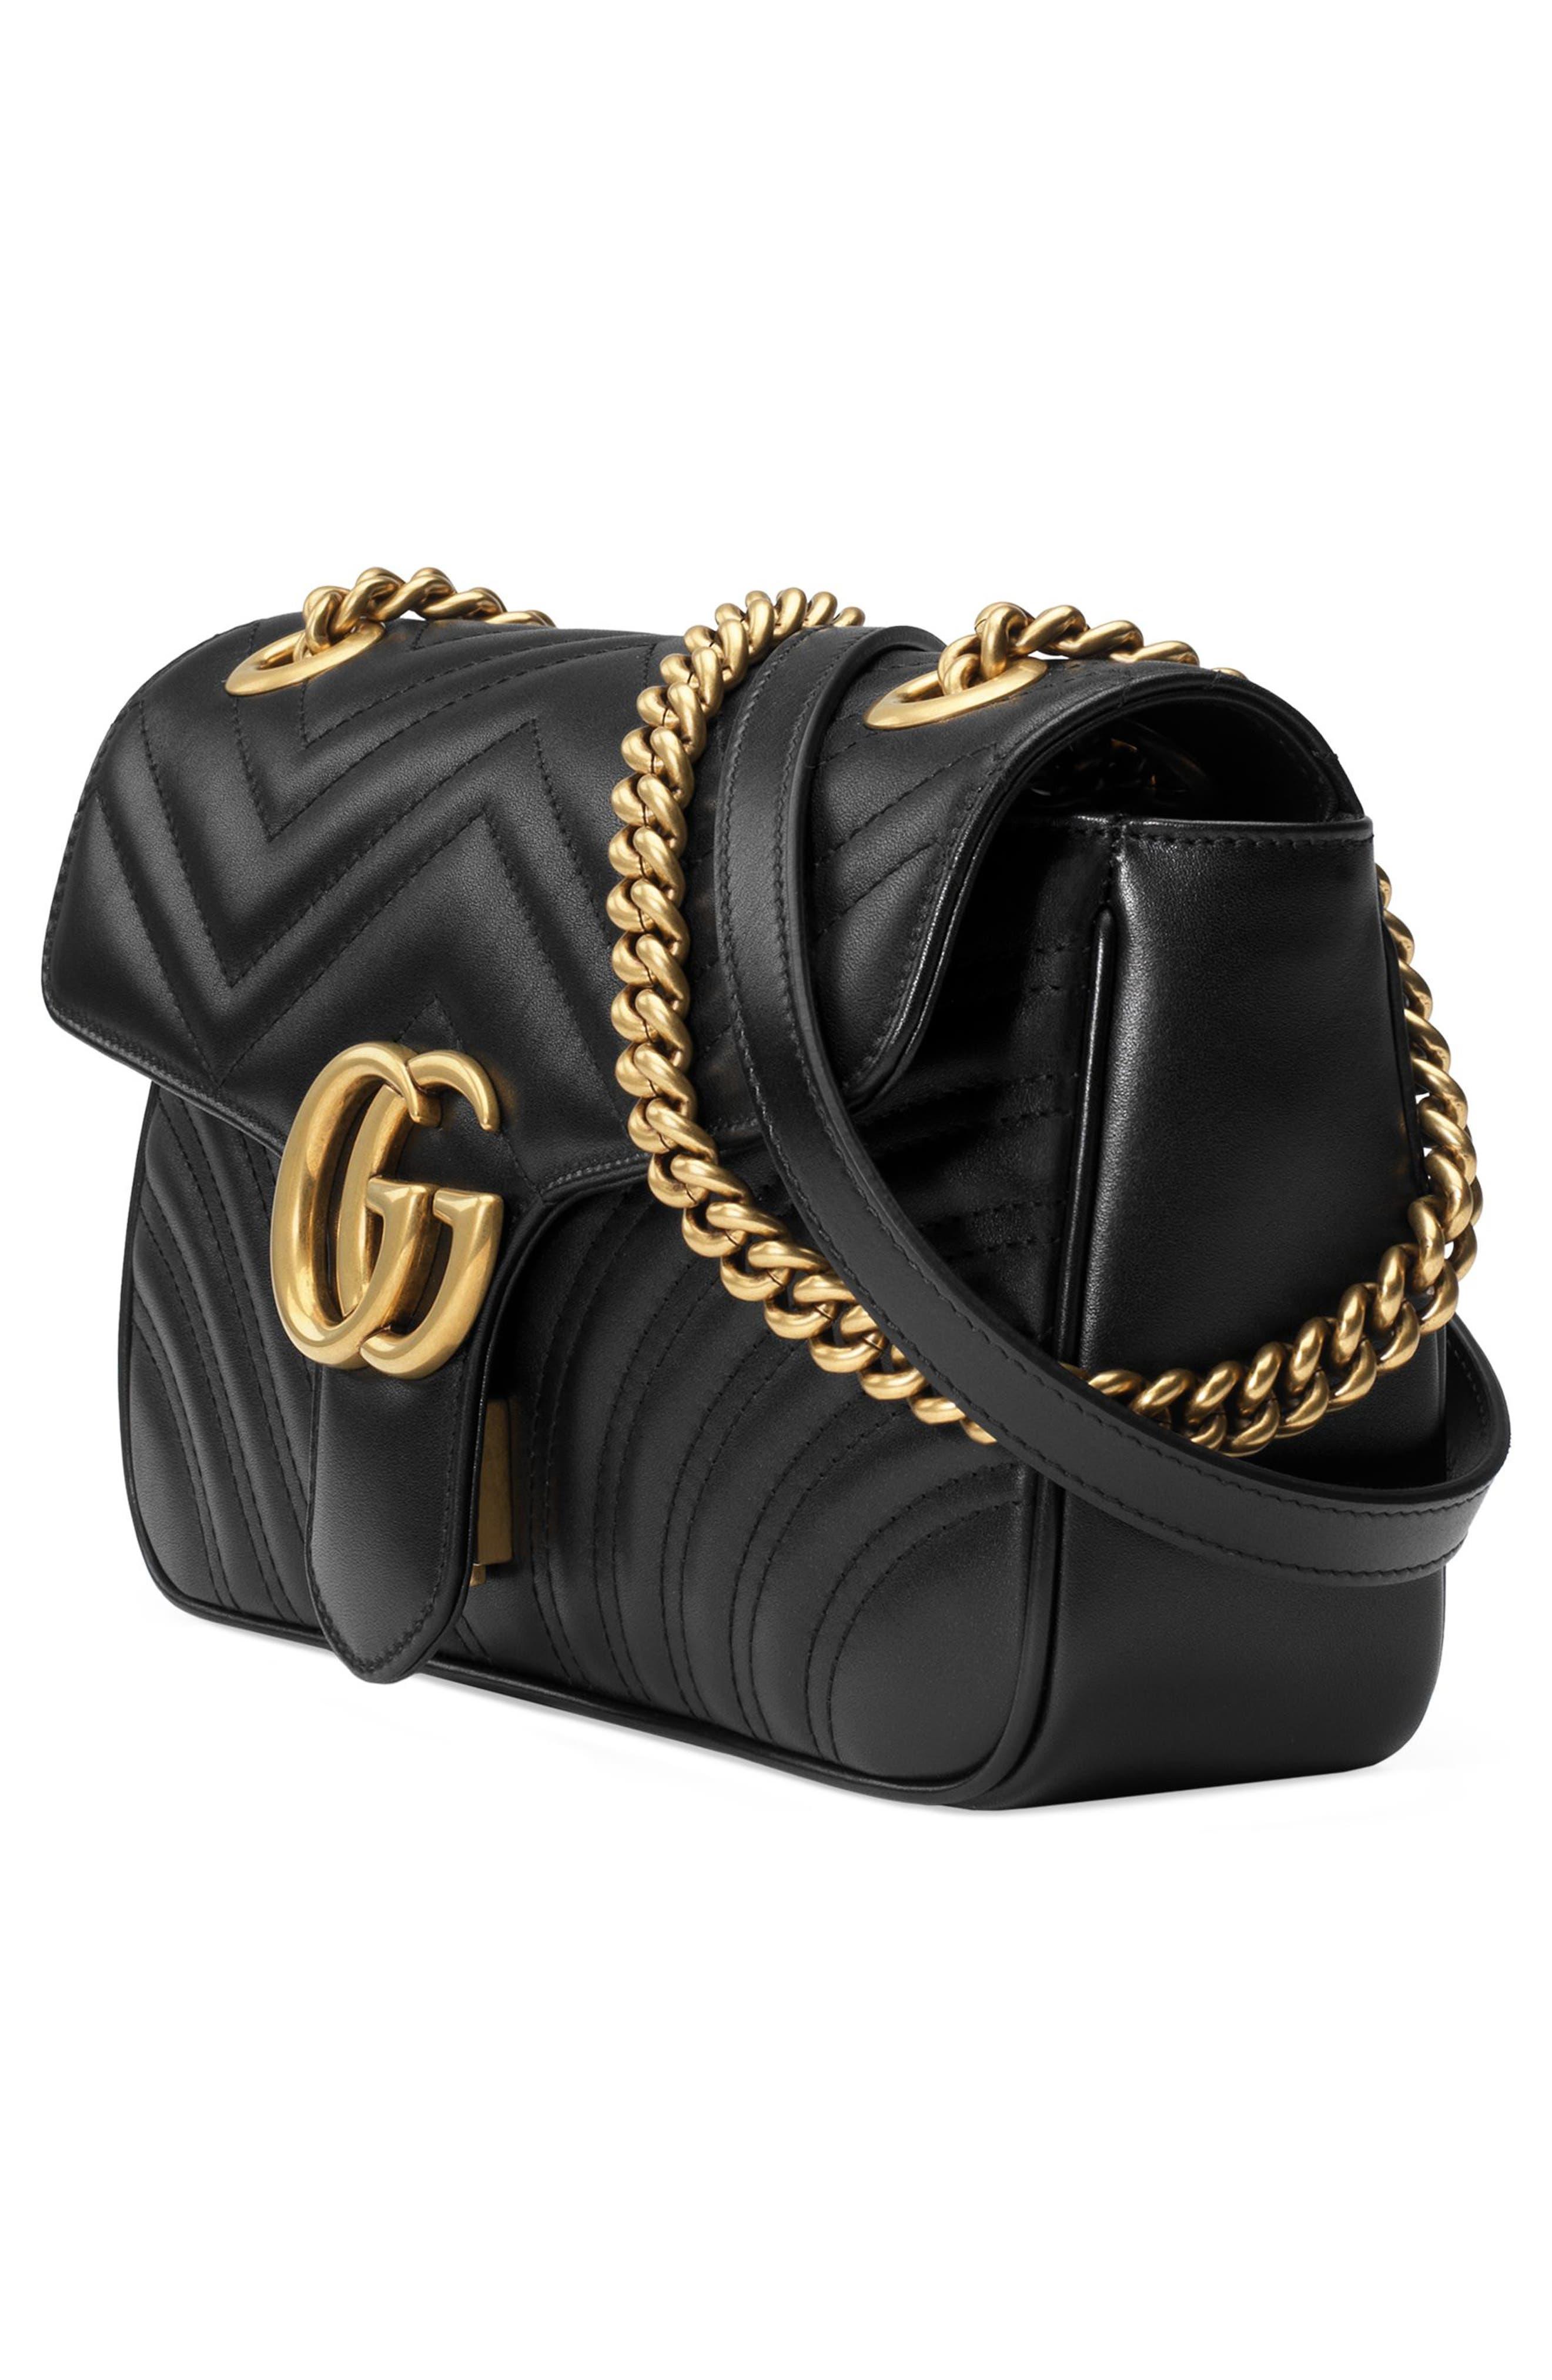 Small GG Marmont 2.0 Matelassé Leather Shoulder Bag,                             Alternate thumbnail 4, color,                             NERO/ NERO